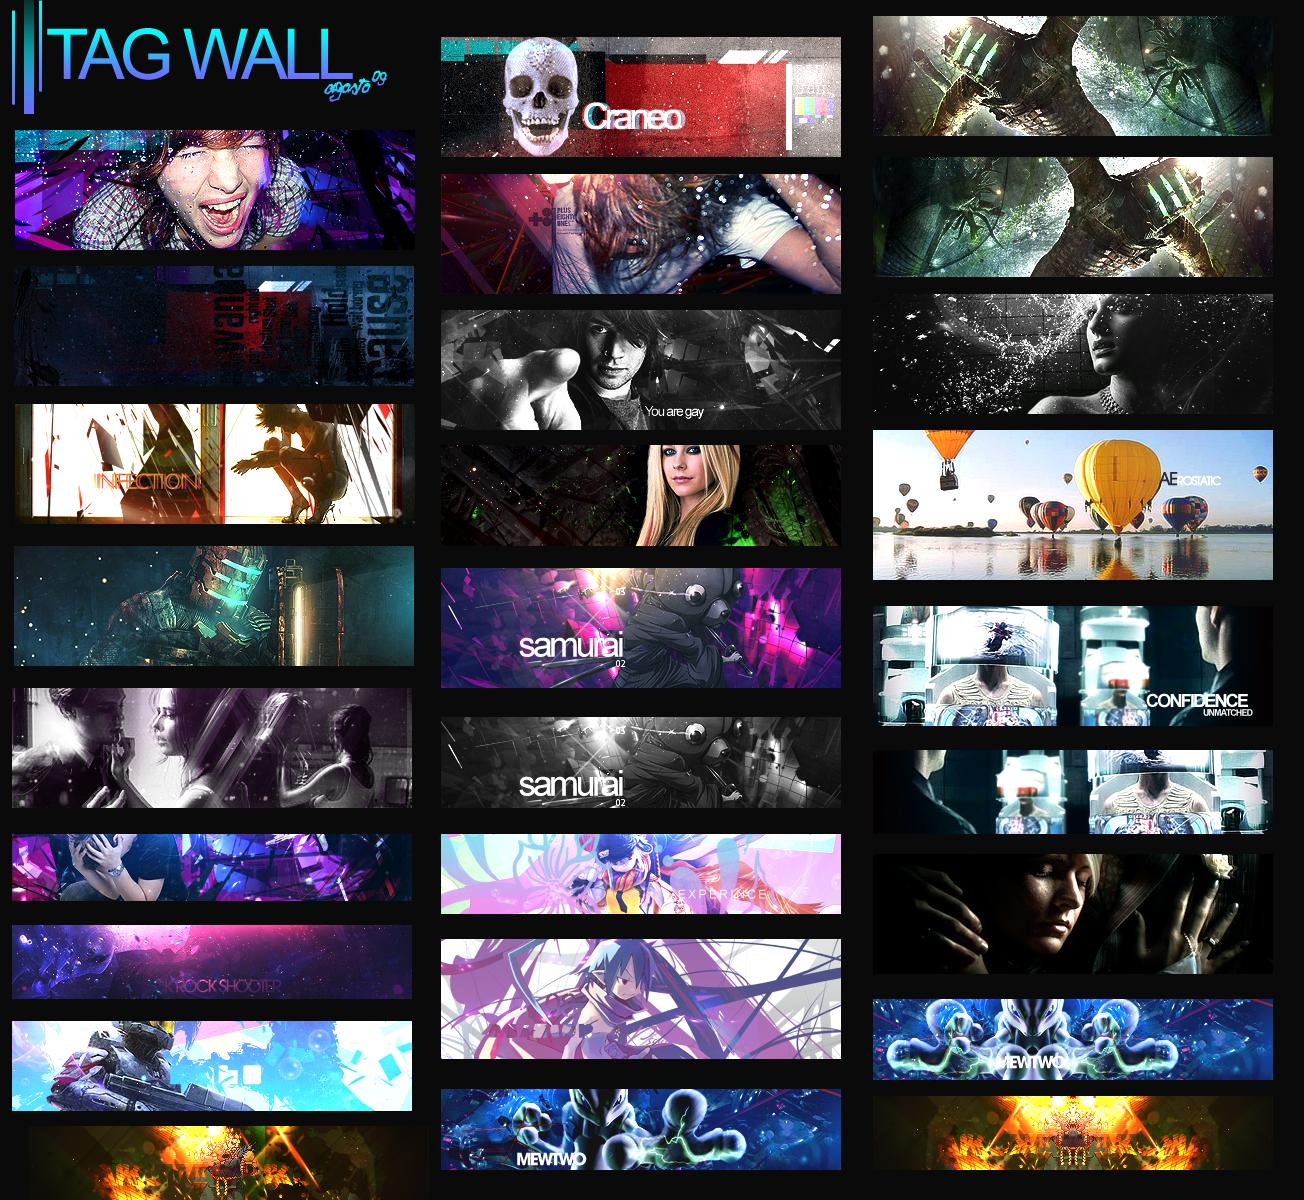 Tag Wall Paranoid by motin45